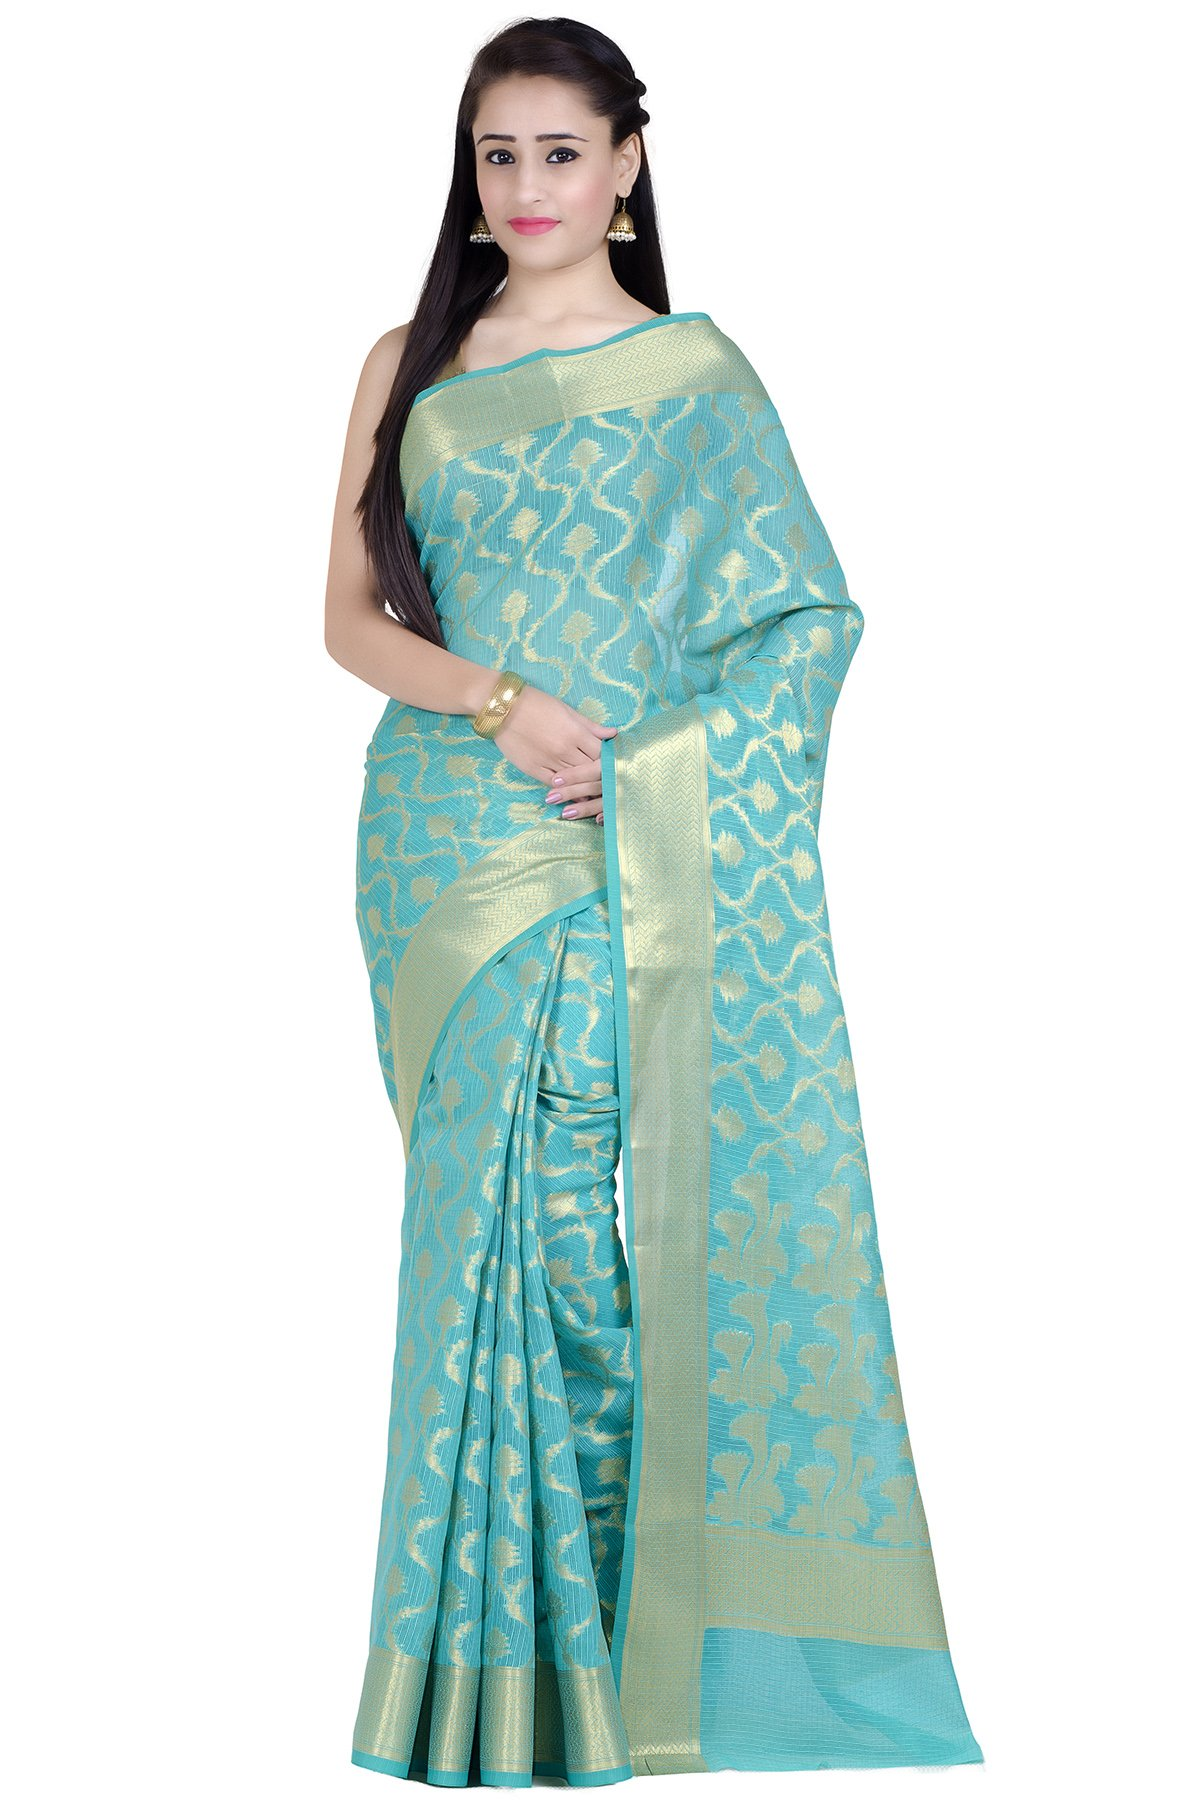 Chandrakala Women's Green Supernet Cotton Banarasi Saree(1272GRE)